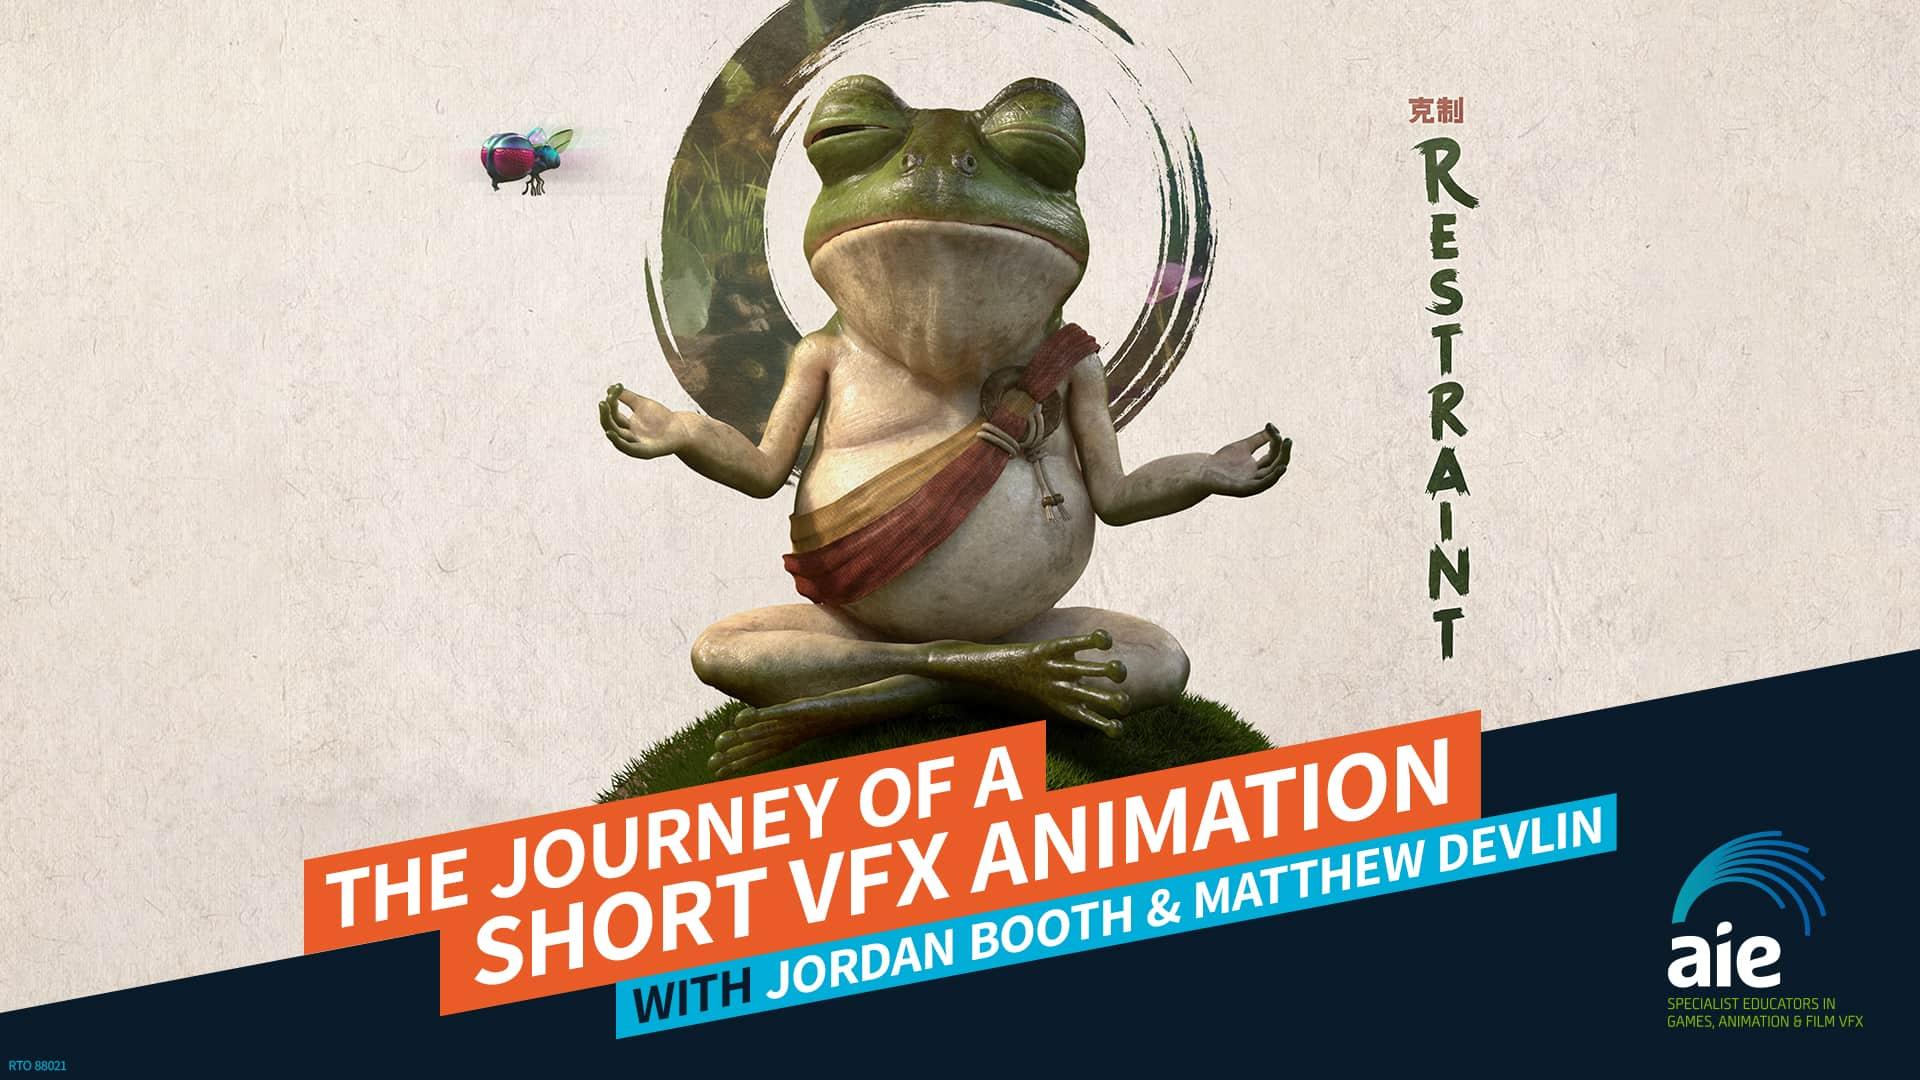 The journey of a short VFX animation Matthew Devlin & Jordan Booth | AIE Workshop